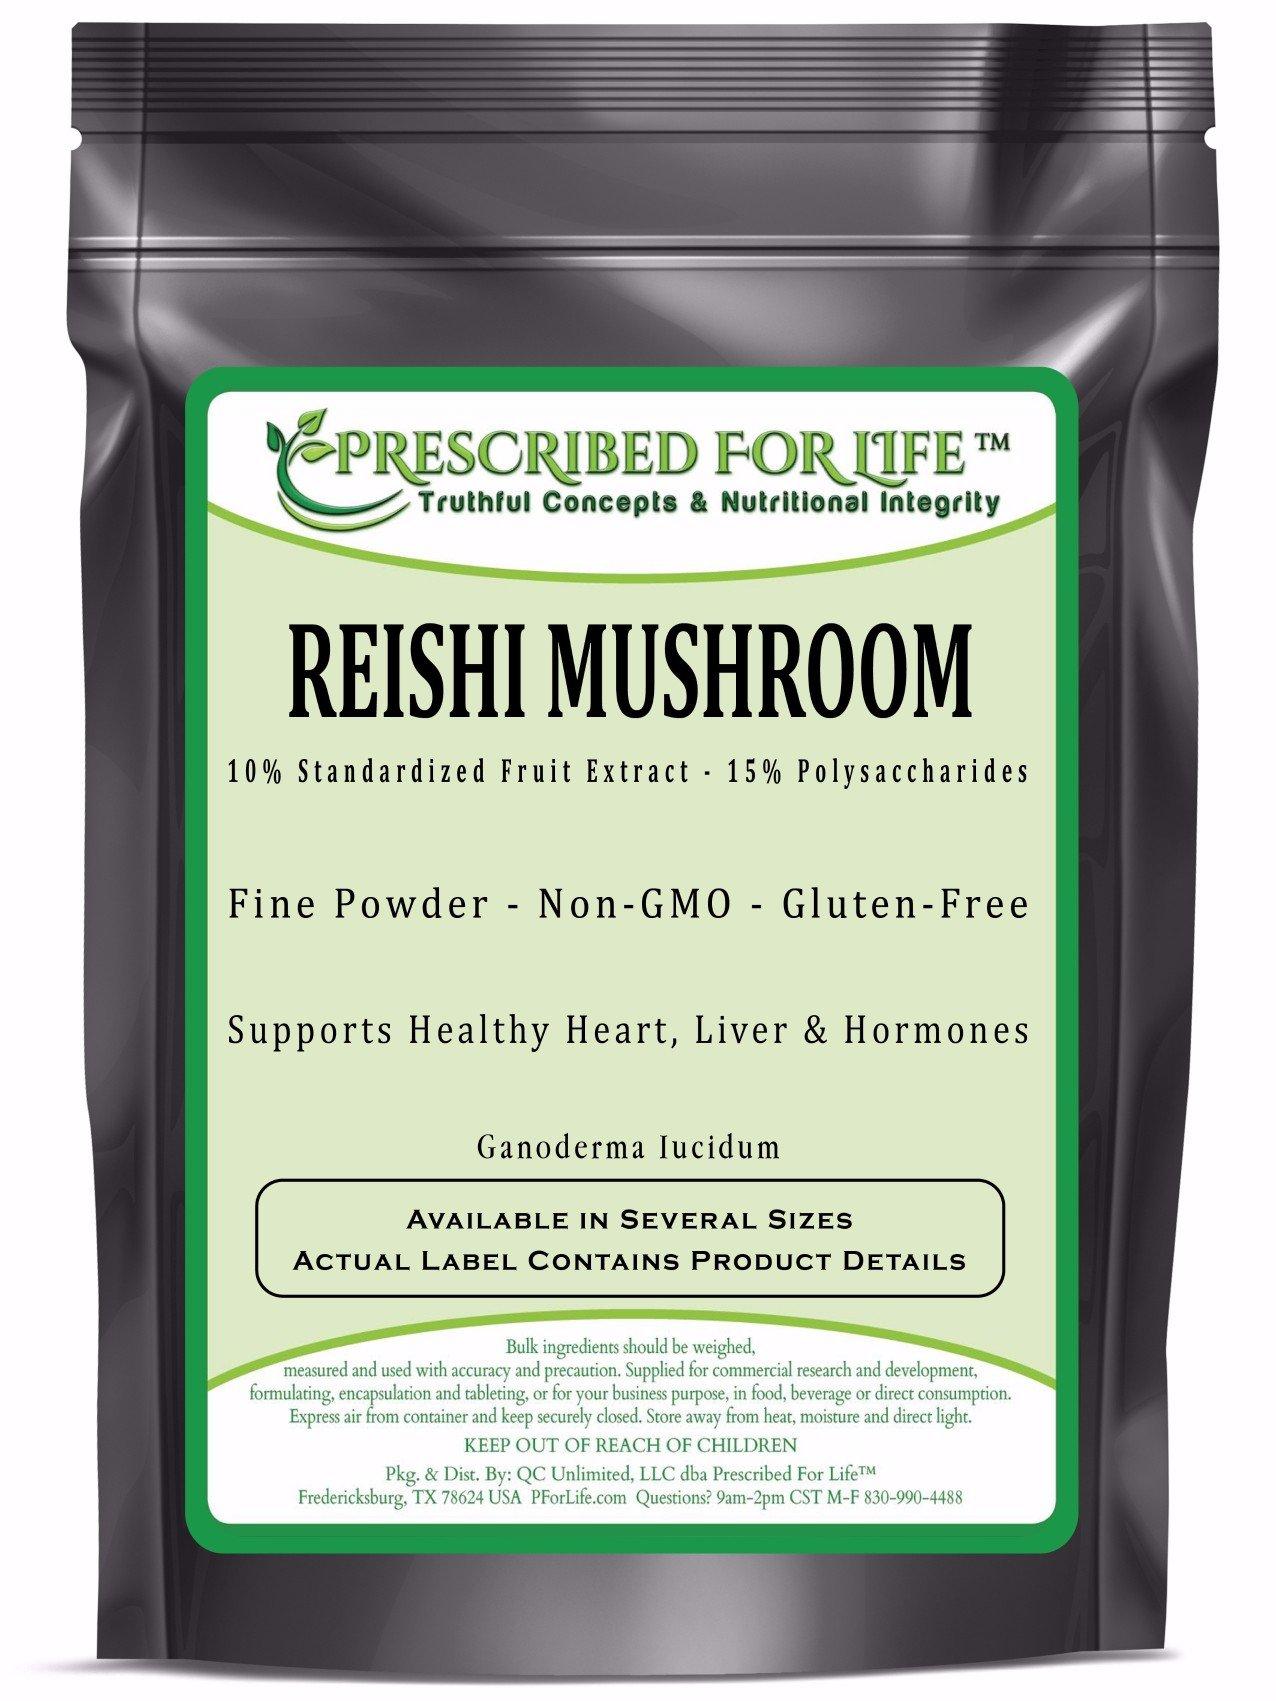 Reishi Mushroom - 15% Polysaccharides - 10% Natural Fruit Powder Extract, 1 kg